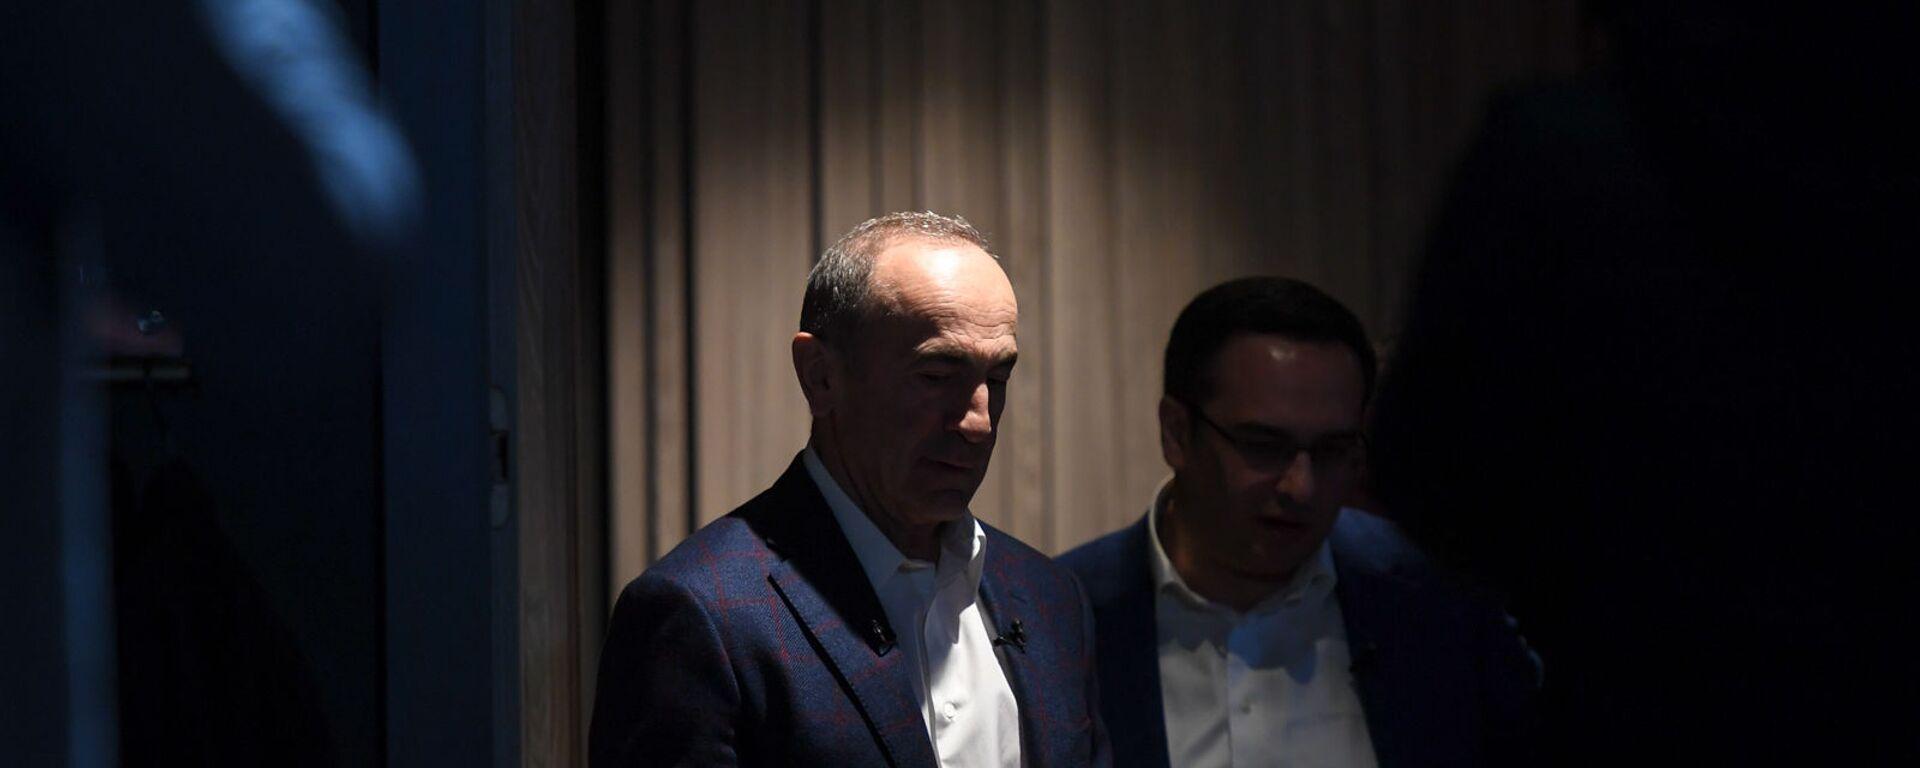 Пресс-конференция второго президента Армении Роберта Кочаряна для российских журналистов (4 марта 2021). Еревaн - Sputnik Армения, 1920, 05.03.2021